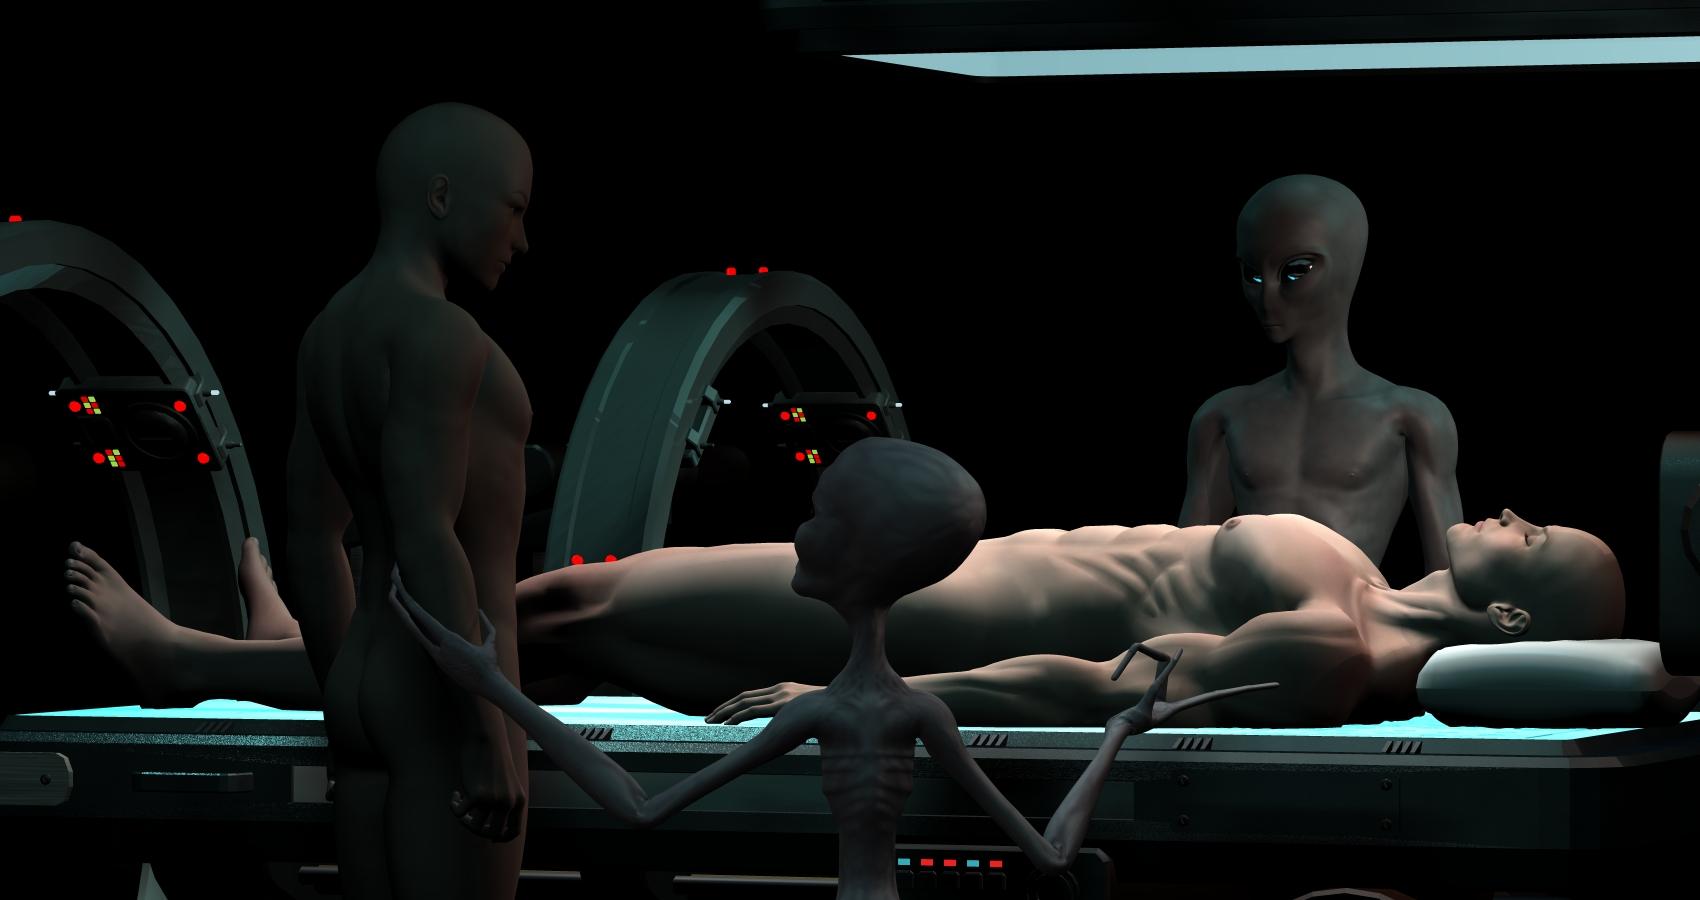 Alien Abductee David Huggins Lost His Virginity To Extra Terrestrial Woman Named Crescent